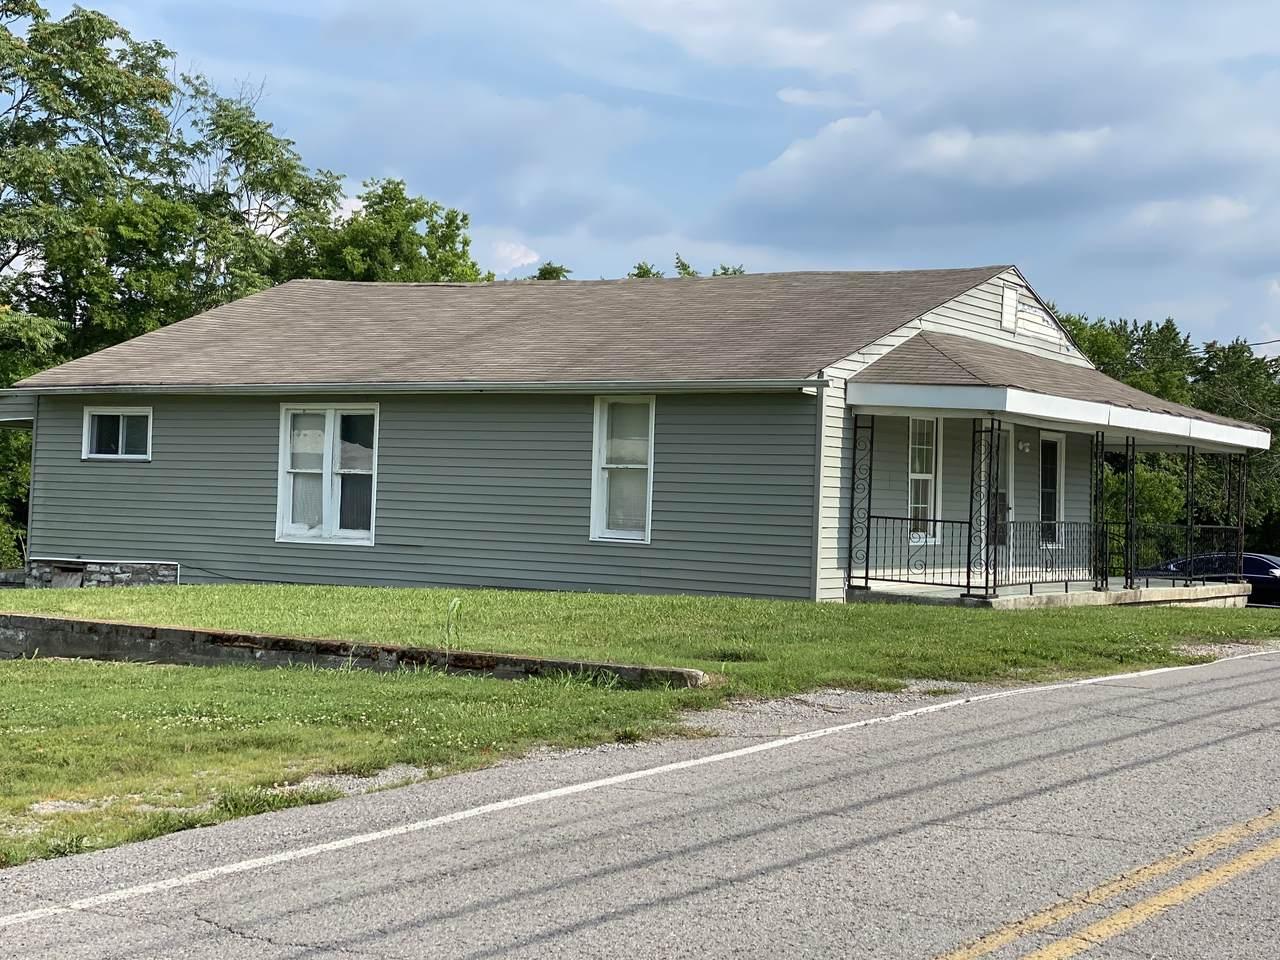 337 Shelbyville Mills Rd - Photo 1